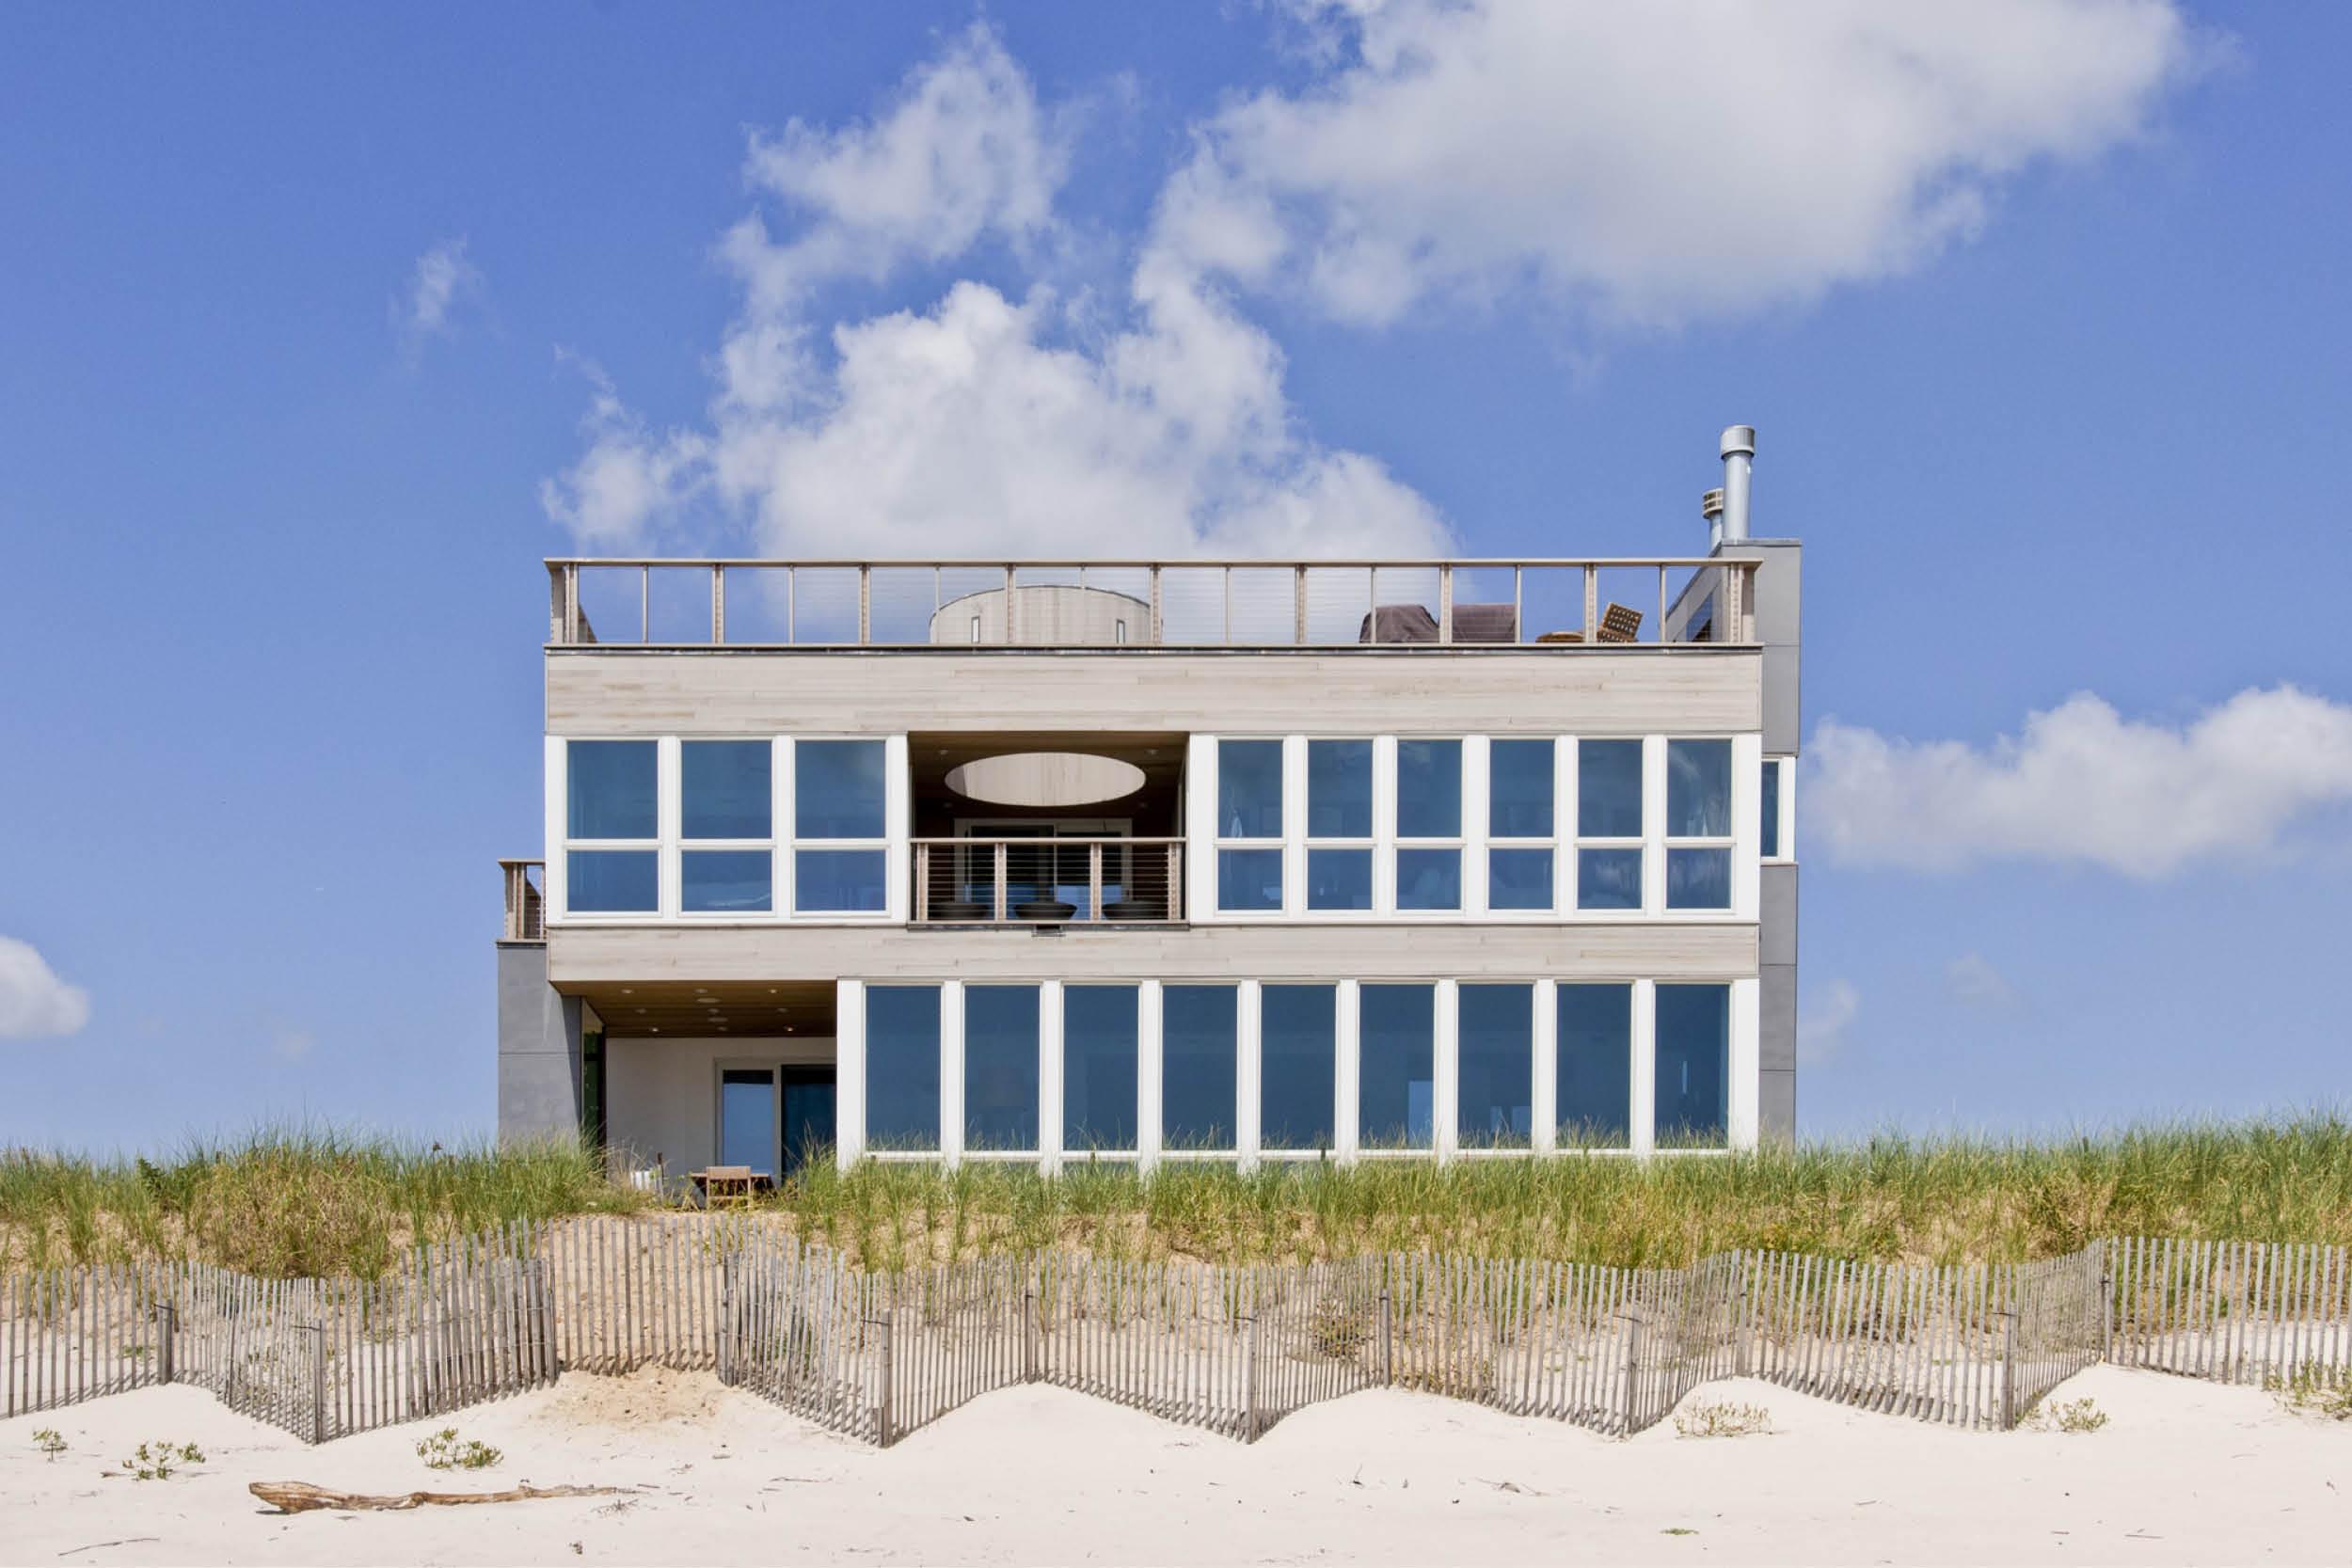 06-res4-resolution-4-architecture-modern-modular-home-prefab-dune-road-beach-house-exterior.jpg